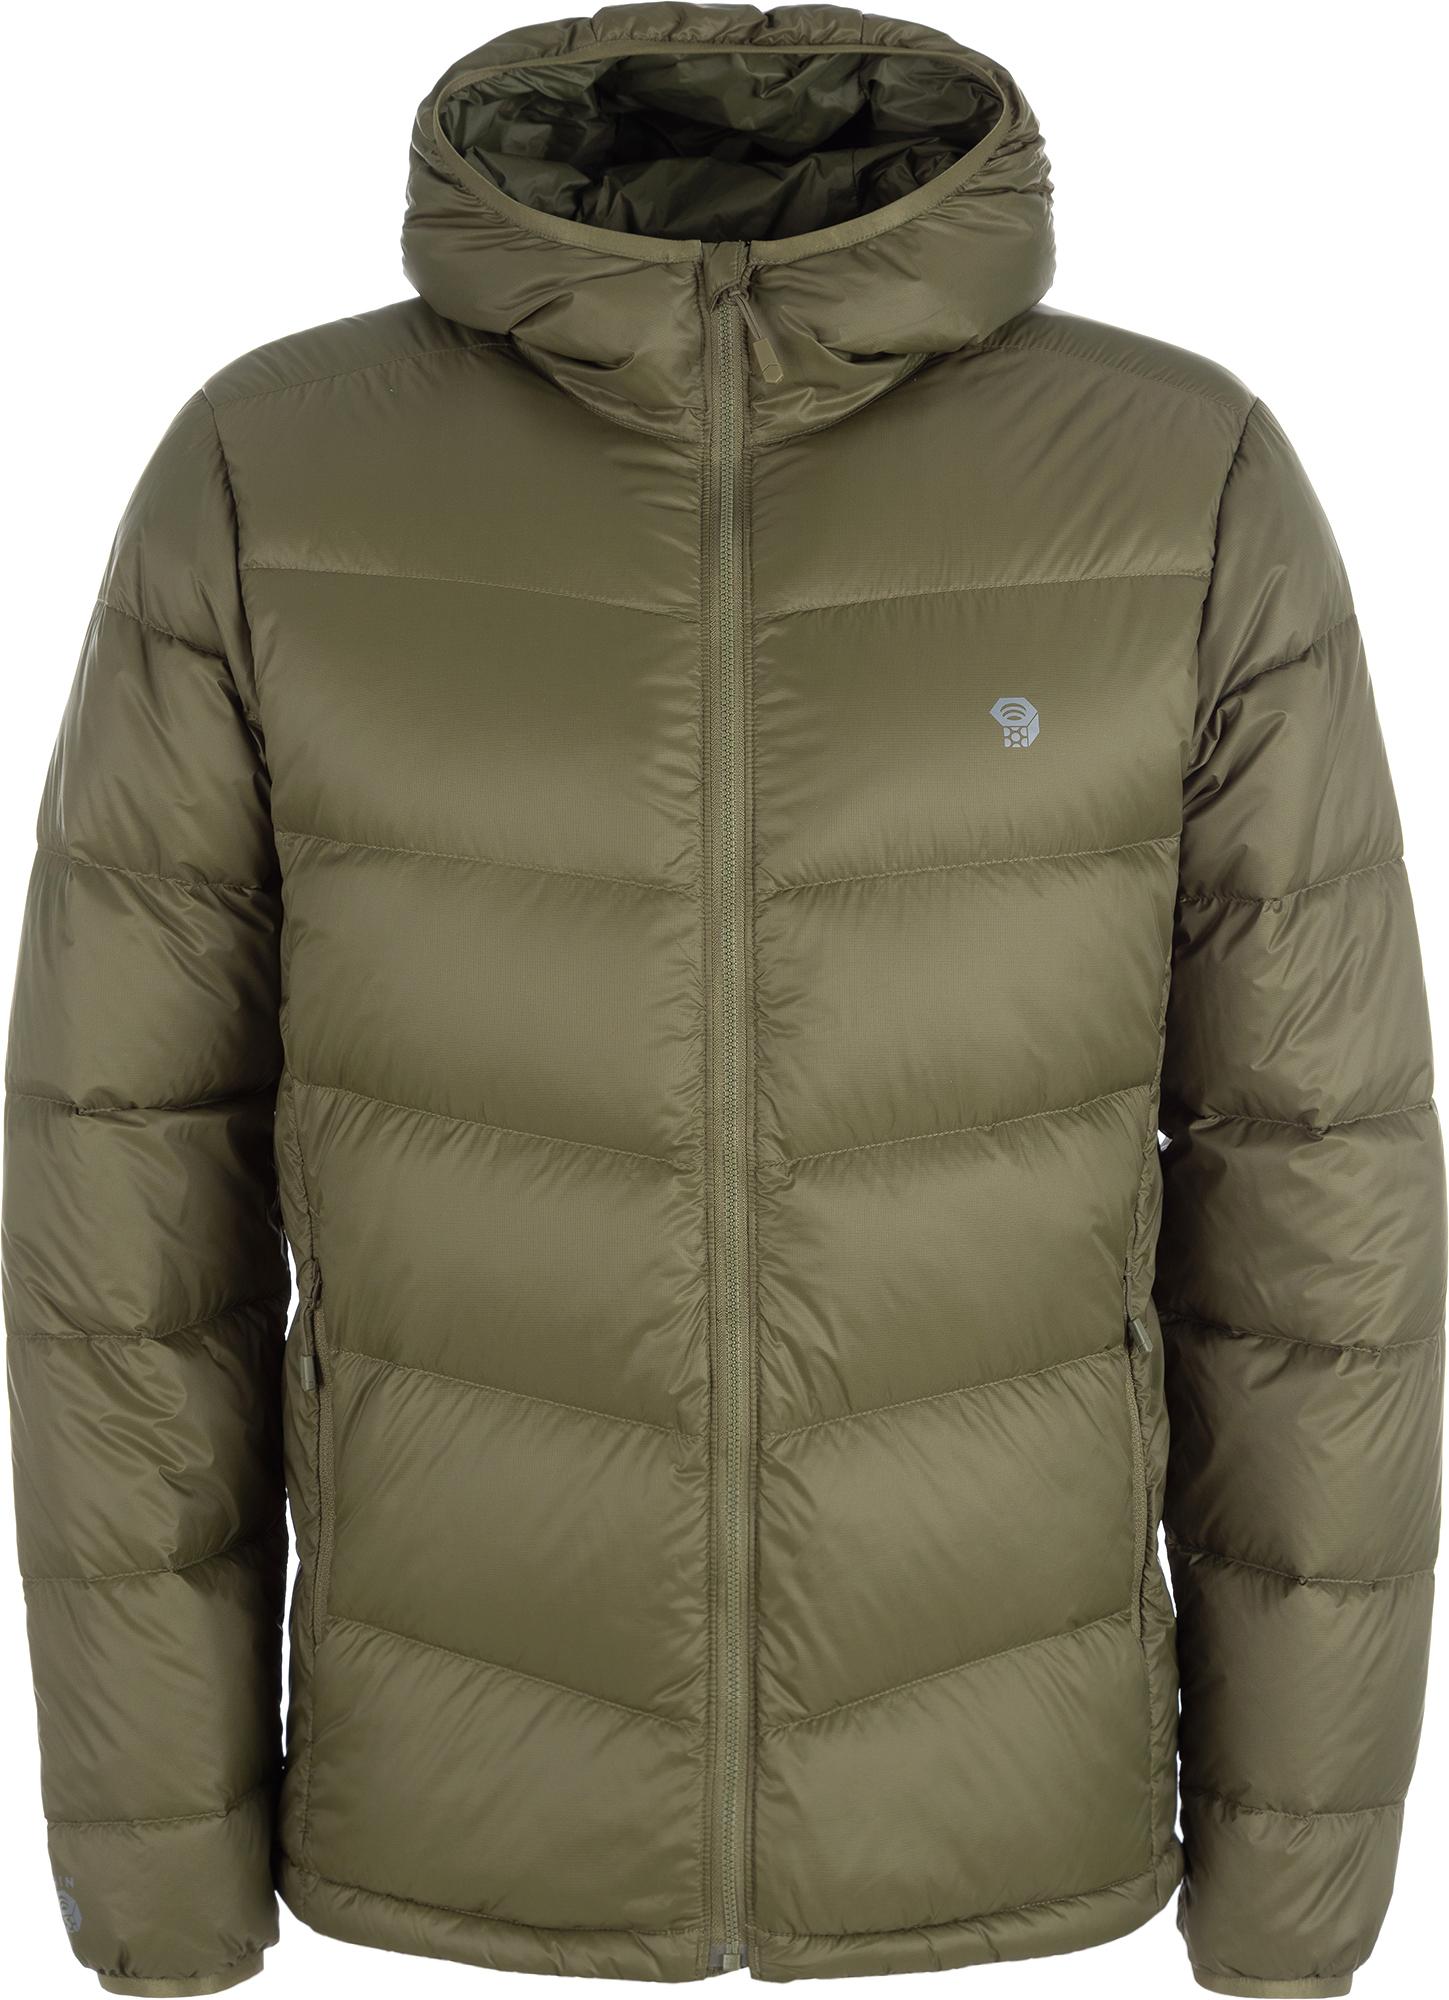 Mountain Hardwear Куртка пуховая мужская Mountain Hardwear Mt. Eyak™, размер 56